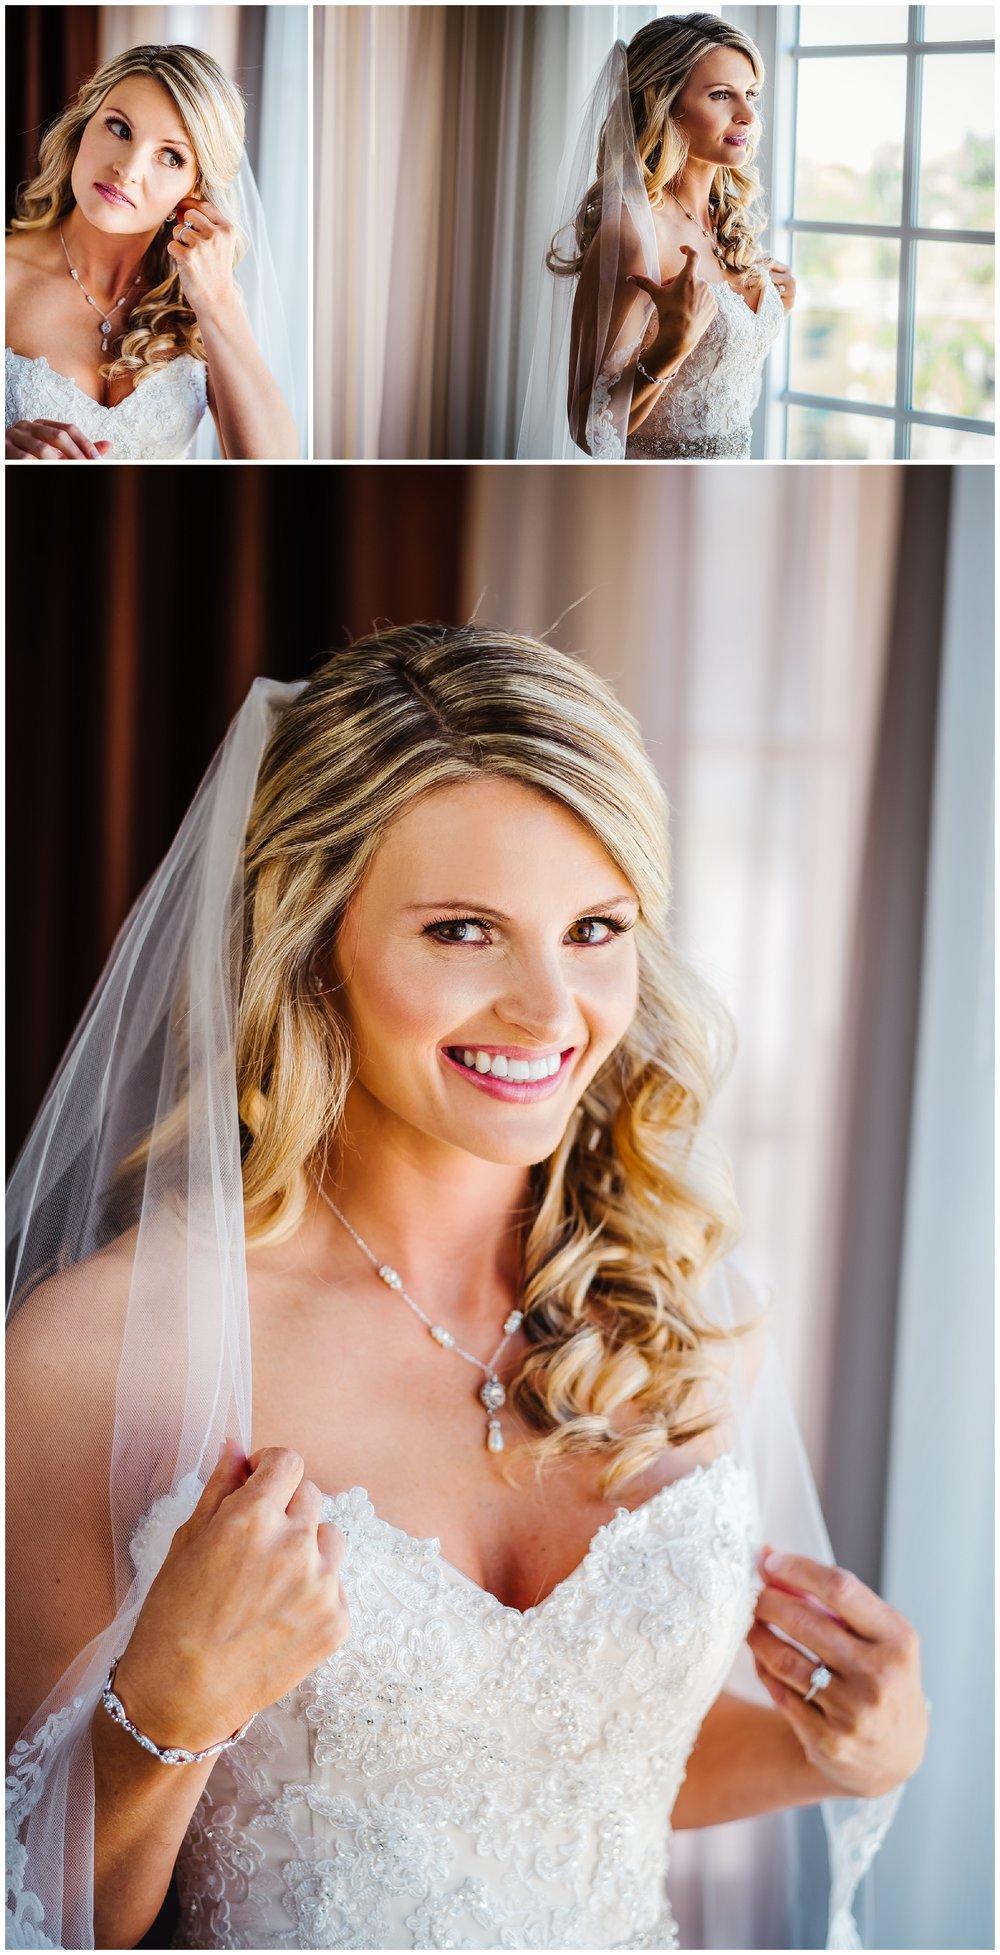 tampa-bradenton-wedding-photographer-south-florida-museum-classic-blush-gold-alpacas-sparklers_0014.jpg